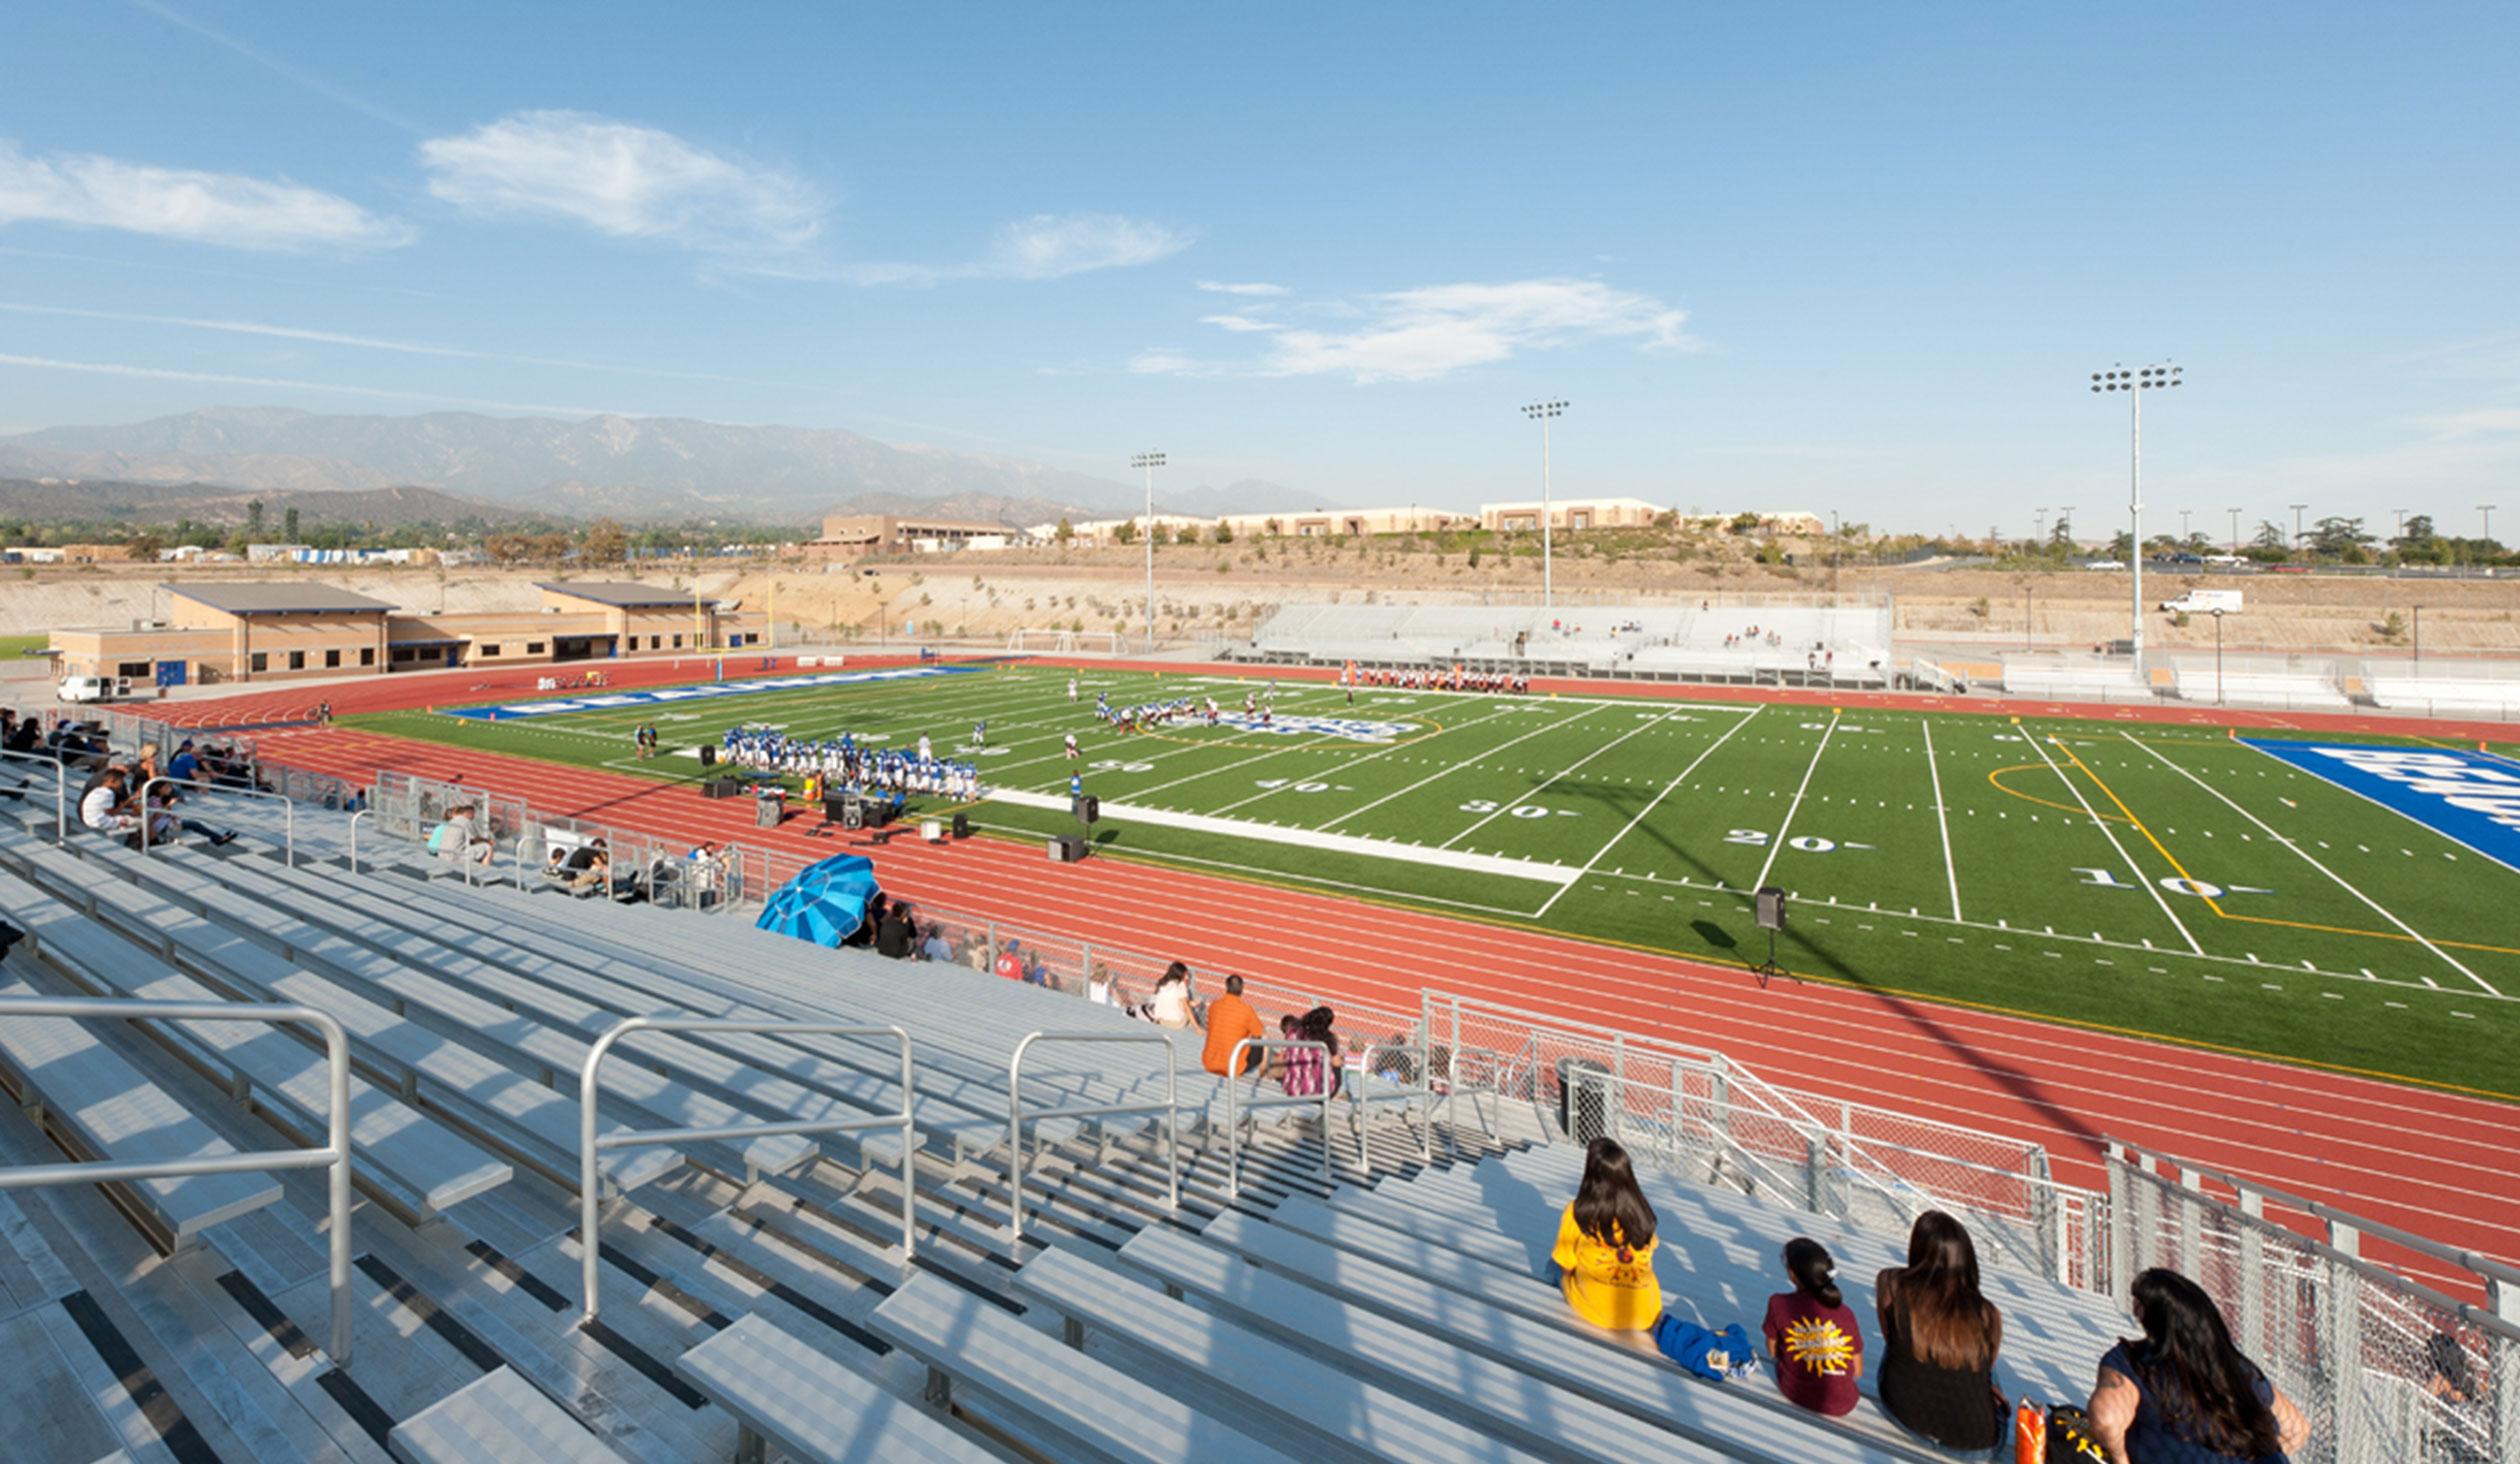 Beaumont High School Cougar Stadium